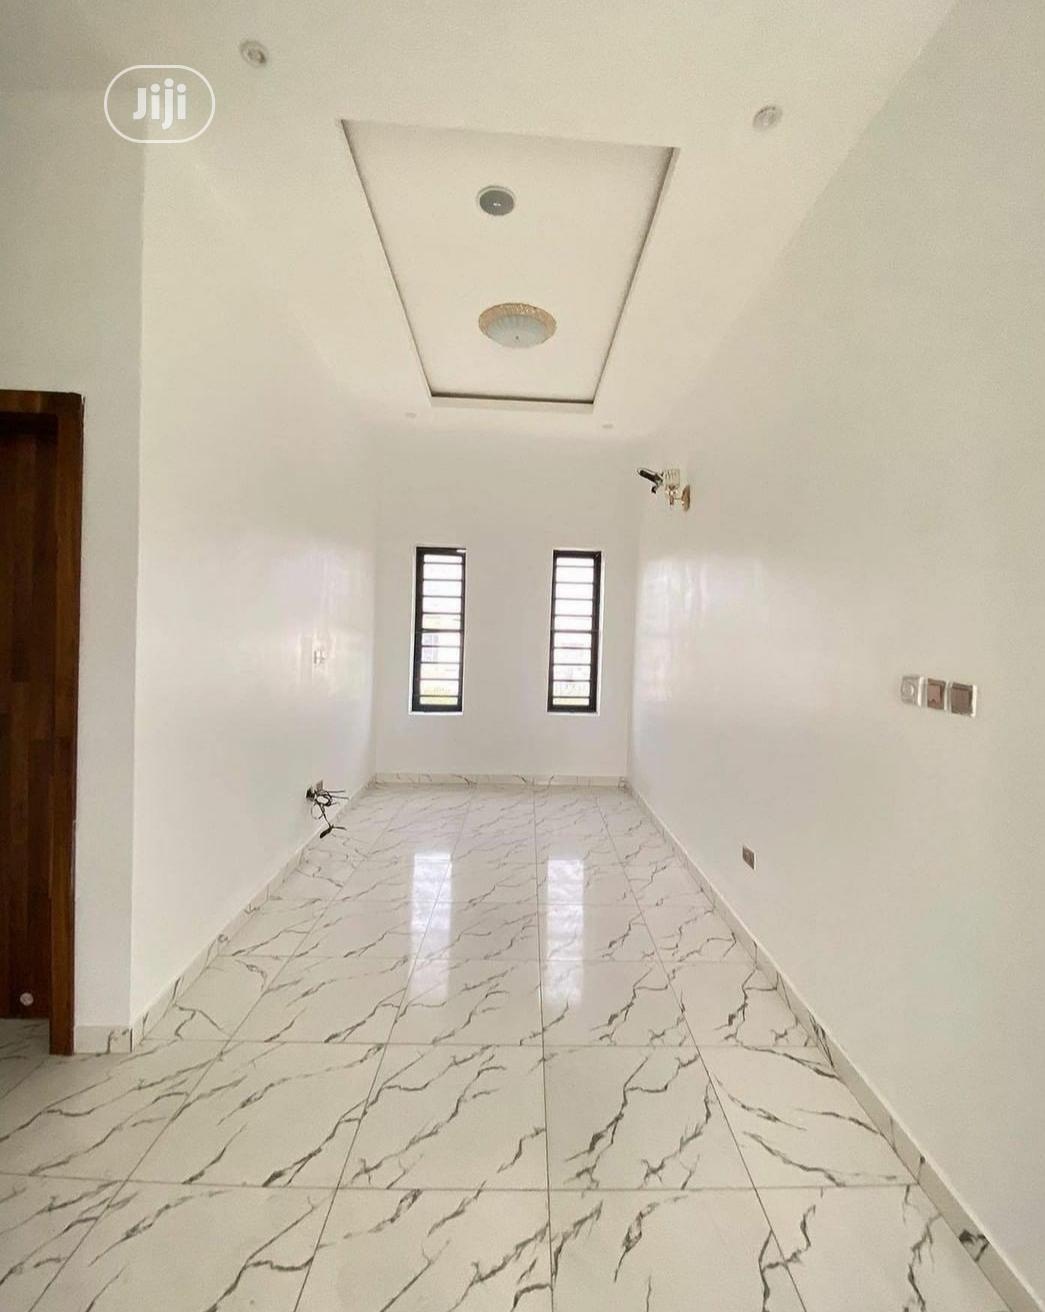 5 Bedroom Duplex for Sale at Lekki Phase 2, Lagos | Houses & Apartments For Sale for sale in Lekki Phase 2, Lekki, Nigeria